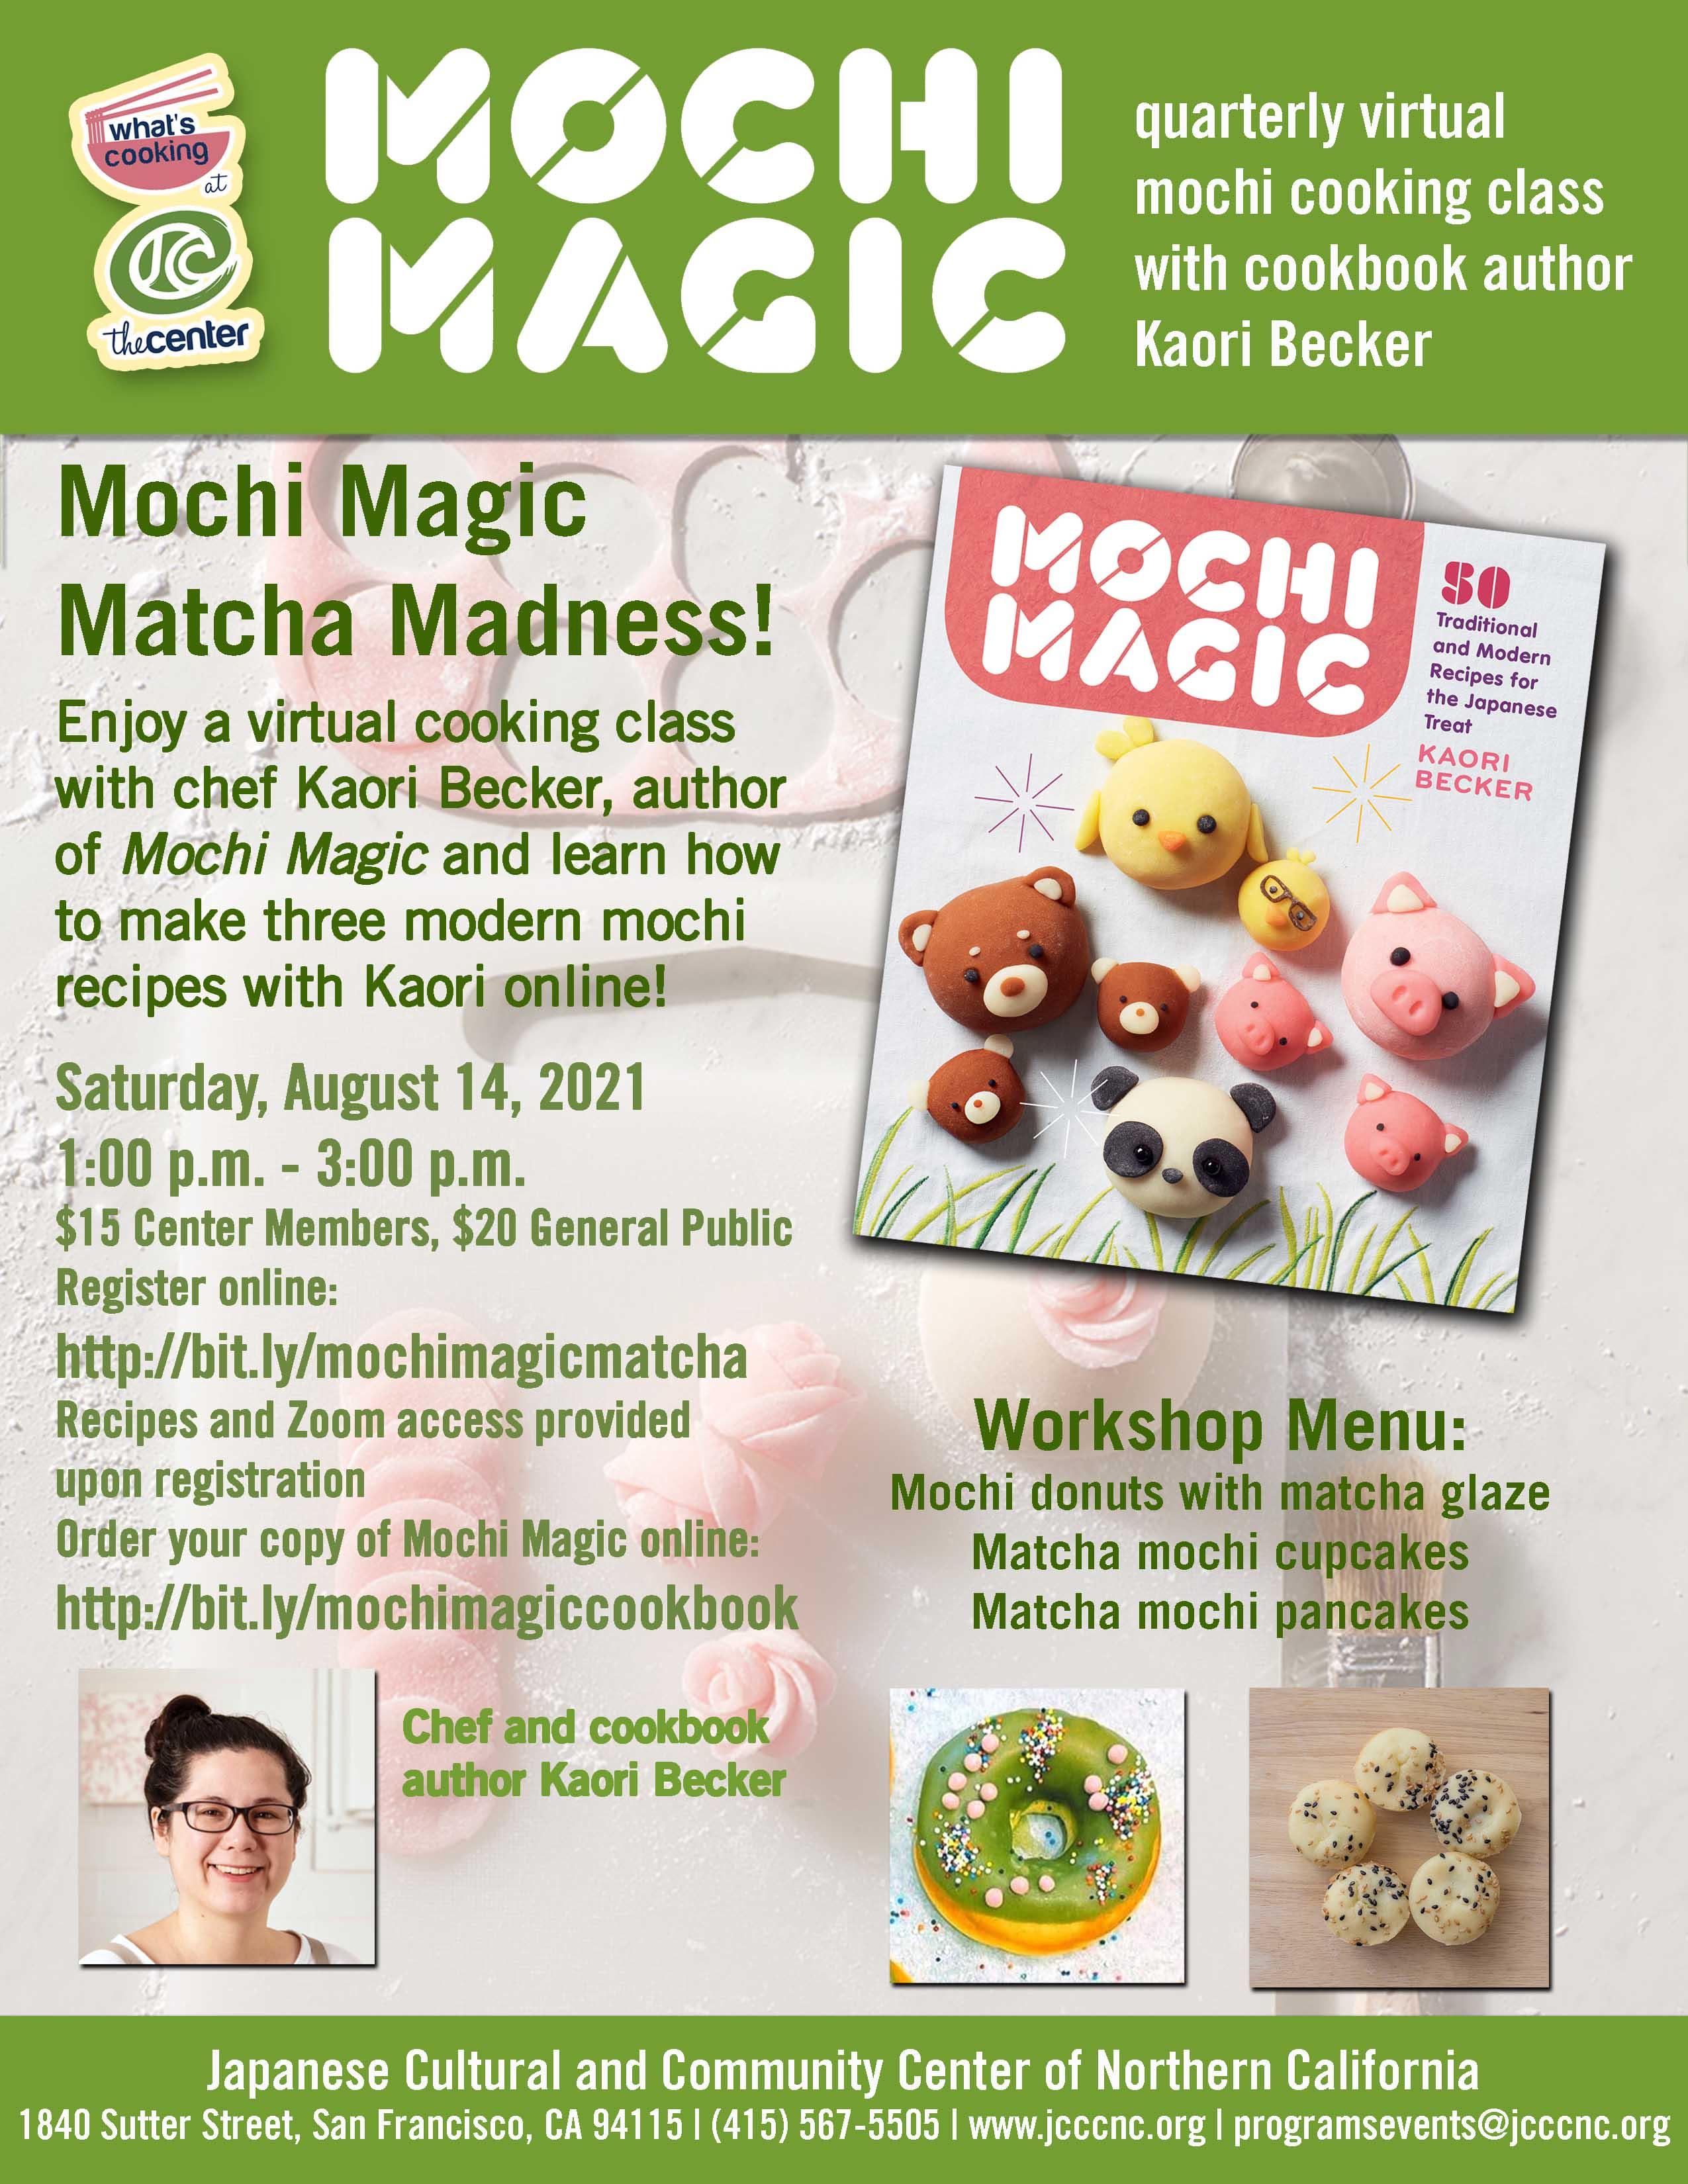 Mochi Magic – Matcha Madness Virtual Cooking Workshop with Chef Kaori Becker